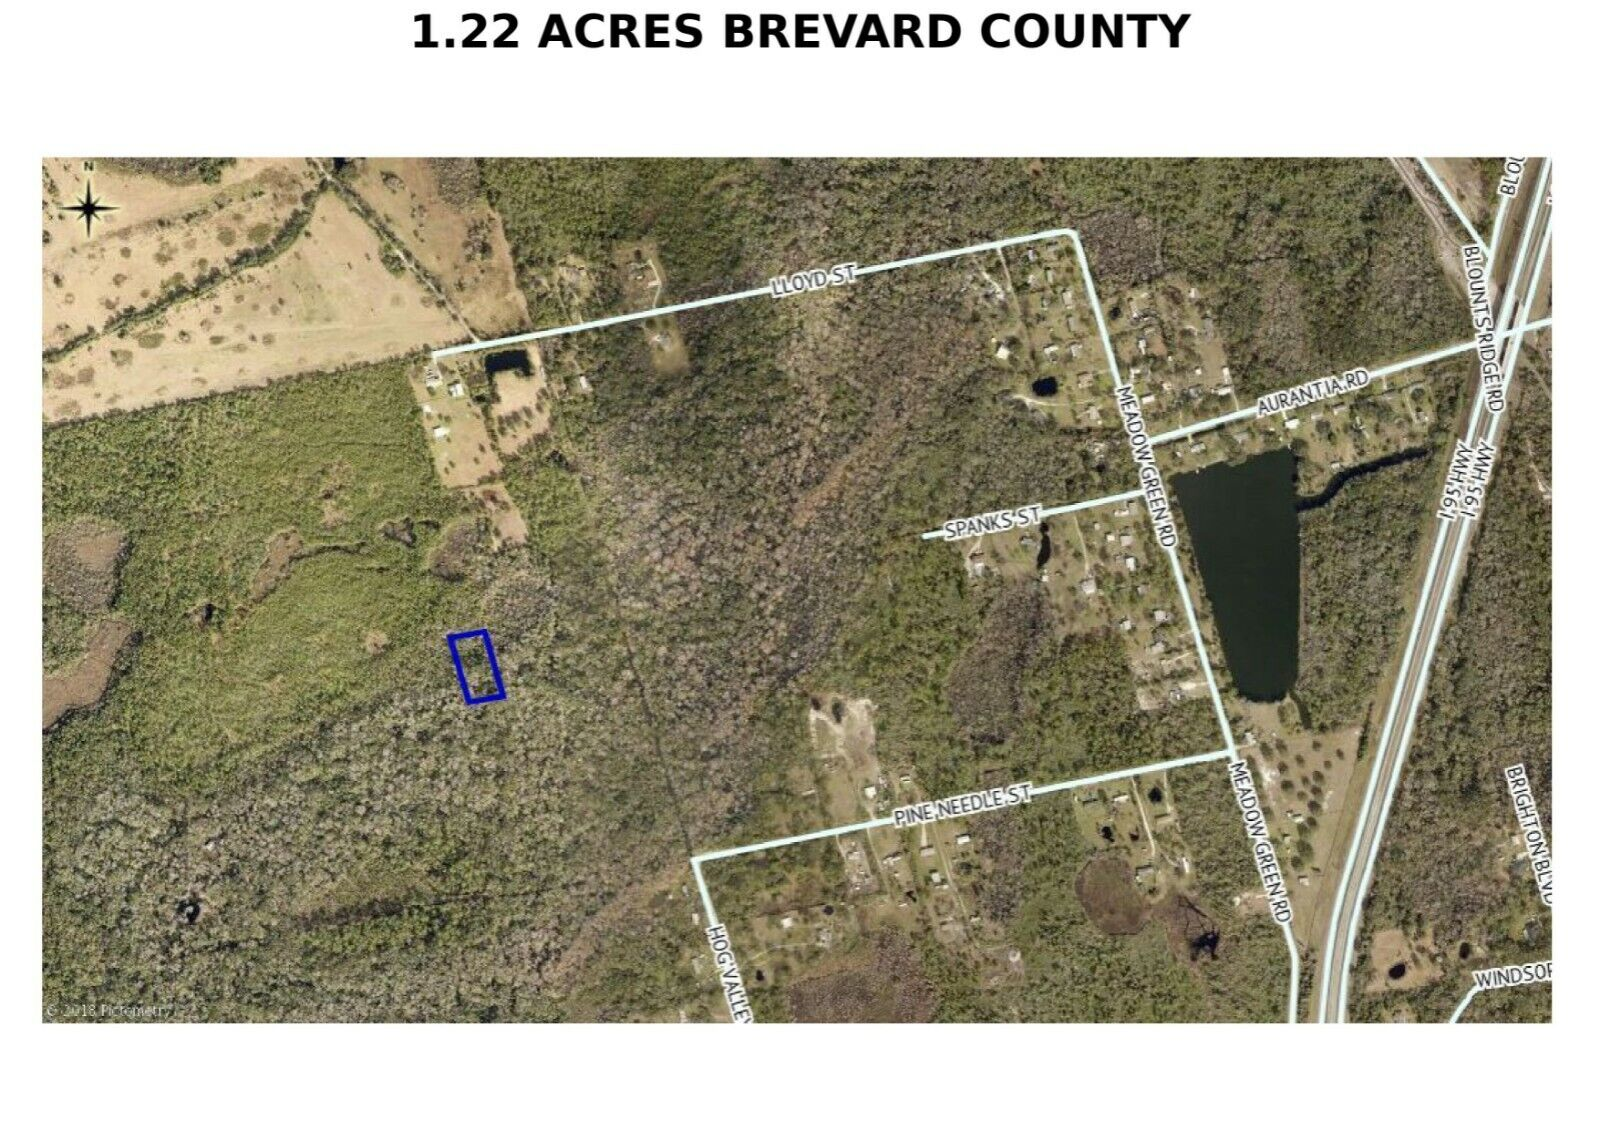 PRE-FORECLOSURE FLORIDA TAX LIEN CERTIFICATE FOR LAND 1.22 AC COCOA, FL BREVARD - $0.99